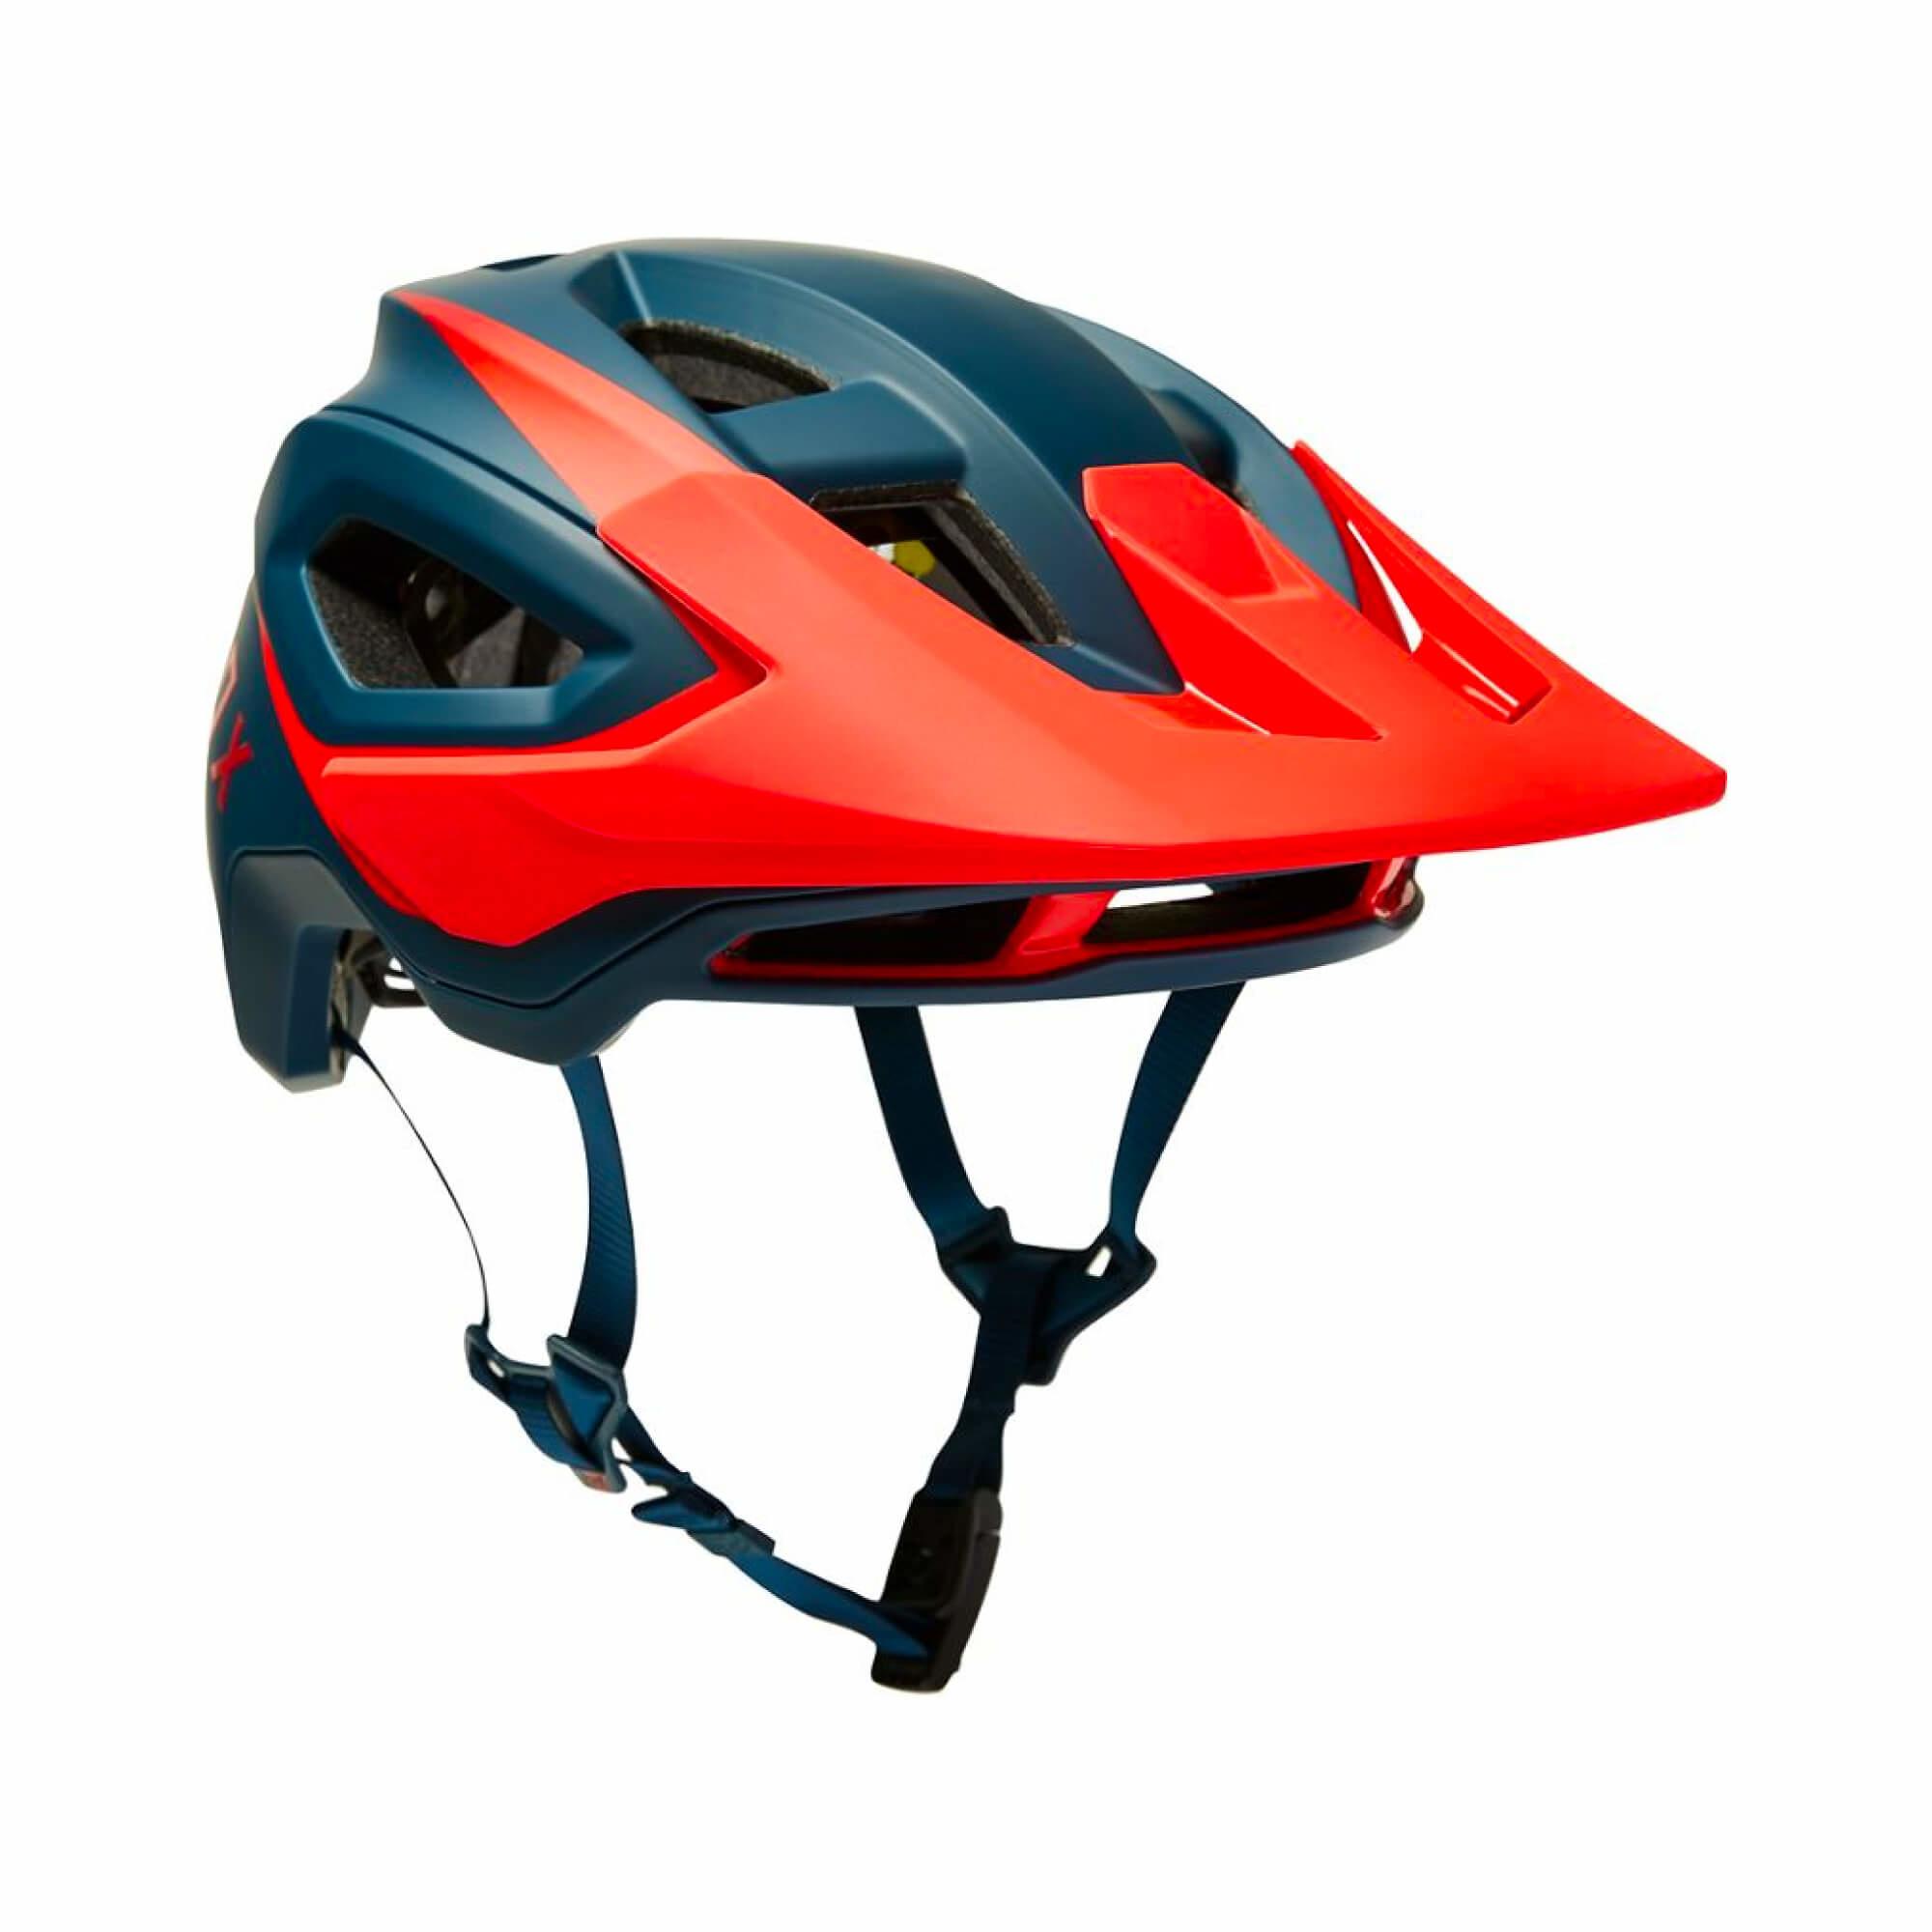 Speedframe Pro Helmet Repeater, As-1